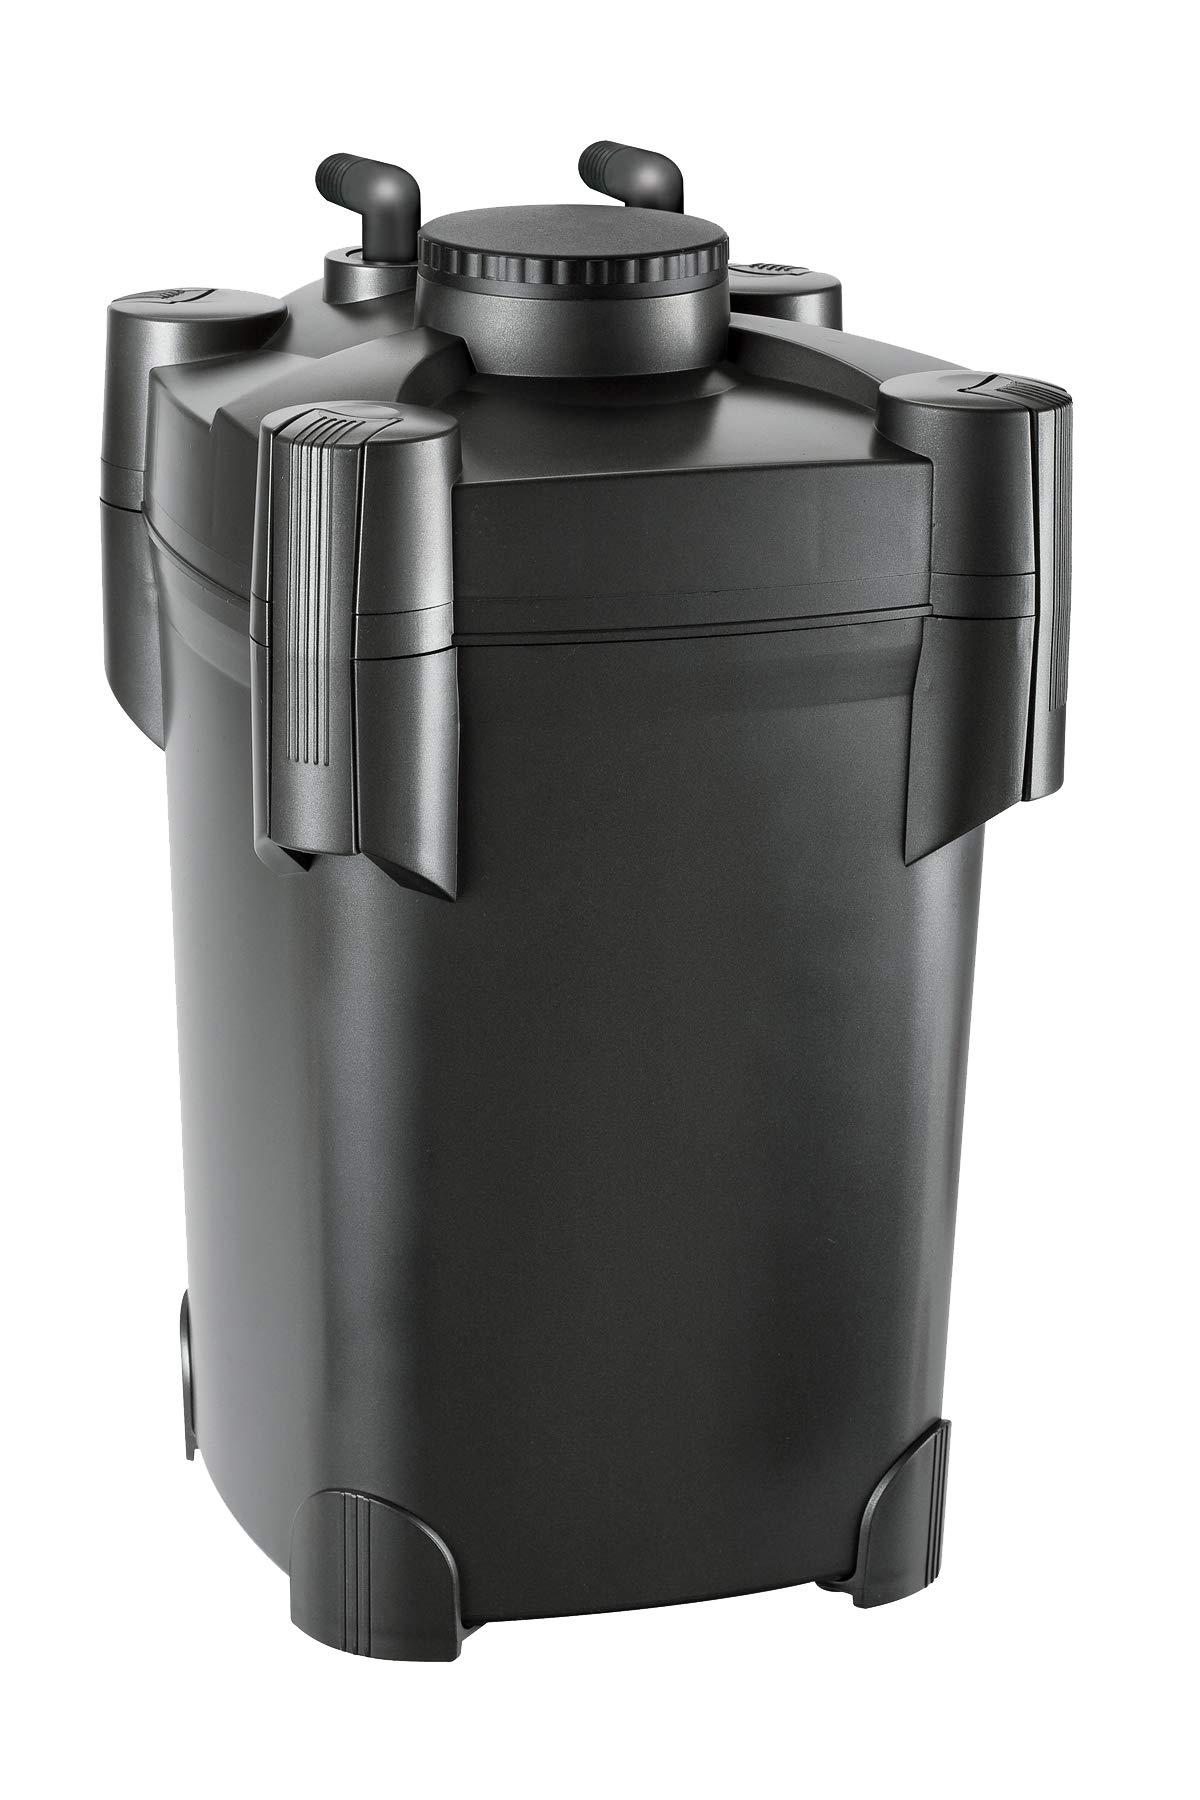 Pondmaster 5430 Danner Manufacturing Compact 1000 Gallon Small to Medium Po Pressurized Pond Filter, Black